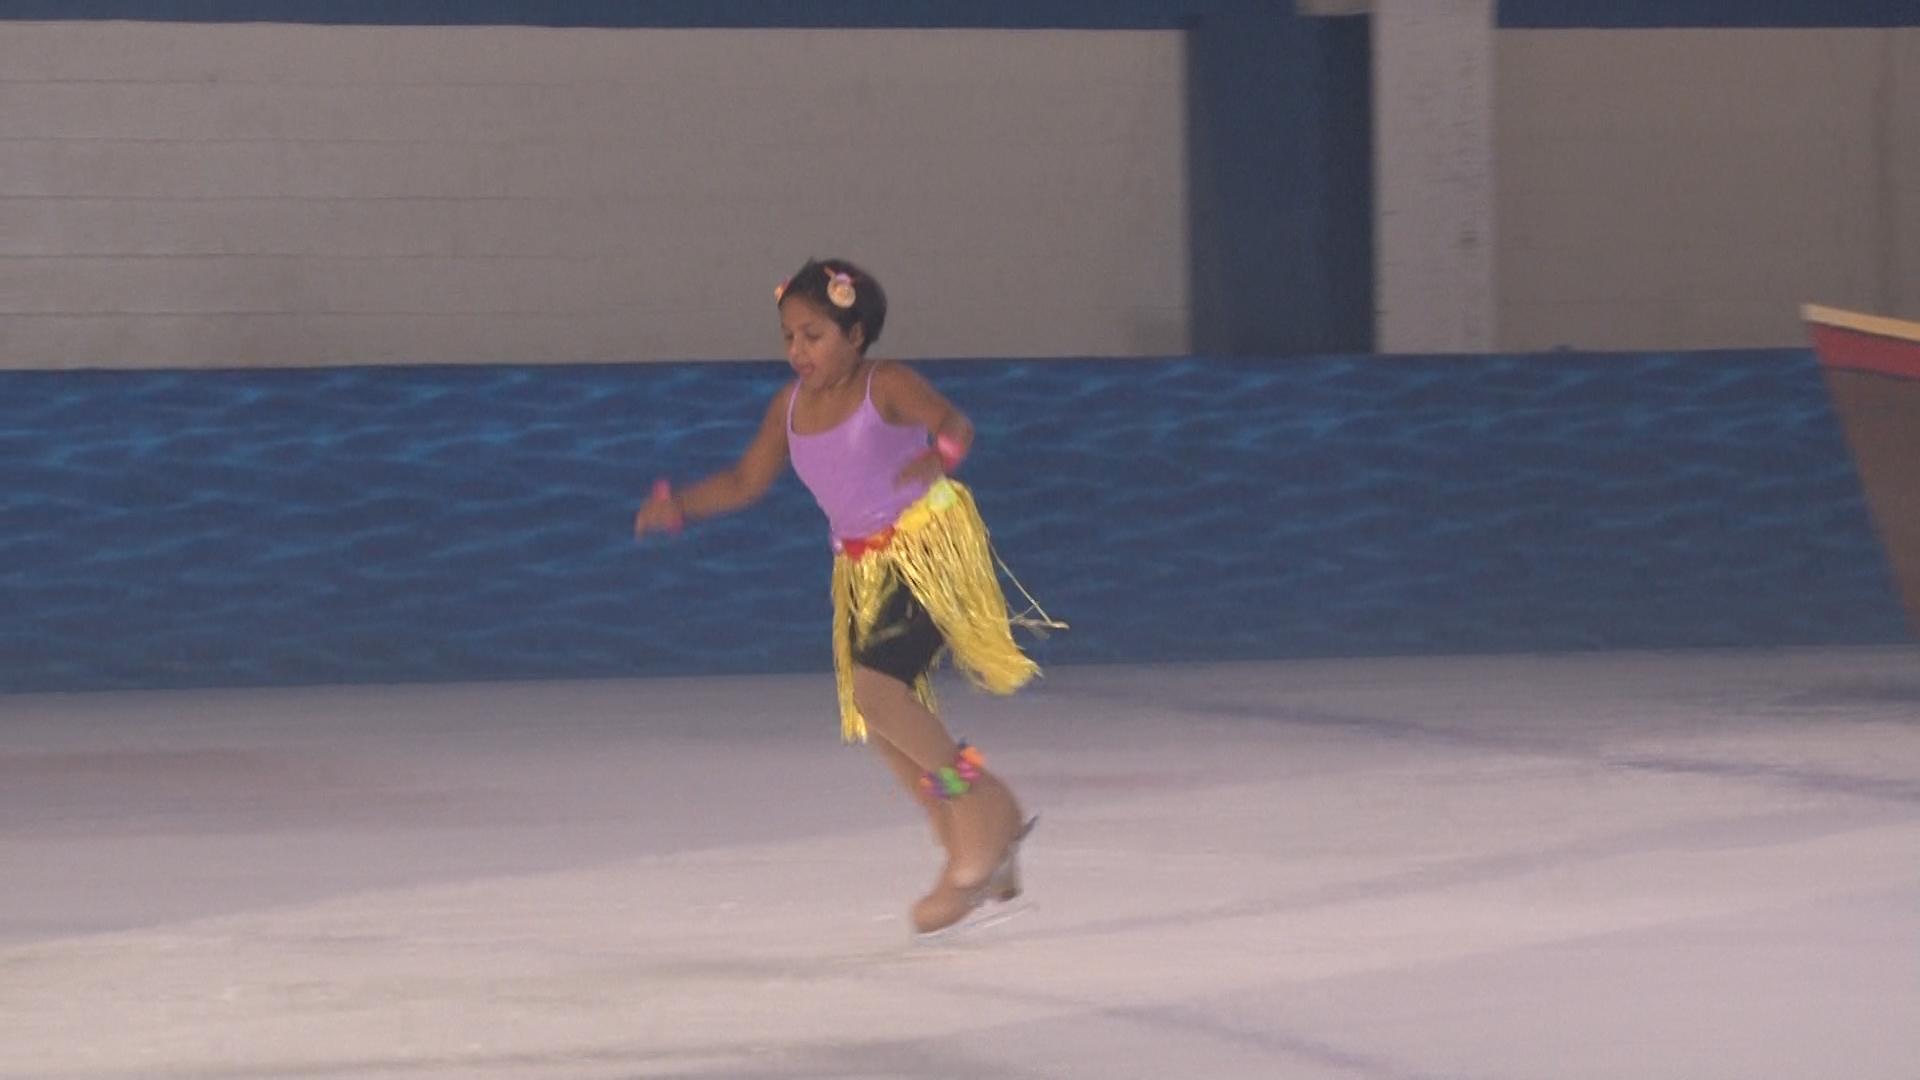 Power Play Maui Skate on Ice 071417.00_59_01_03.Still090.jpg